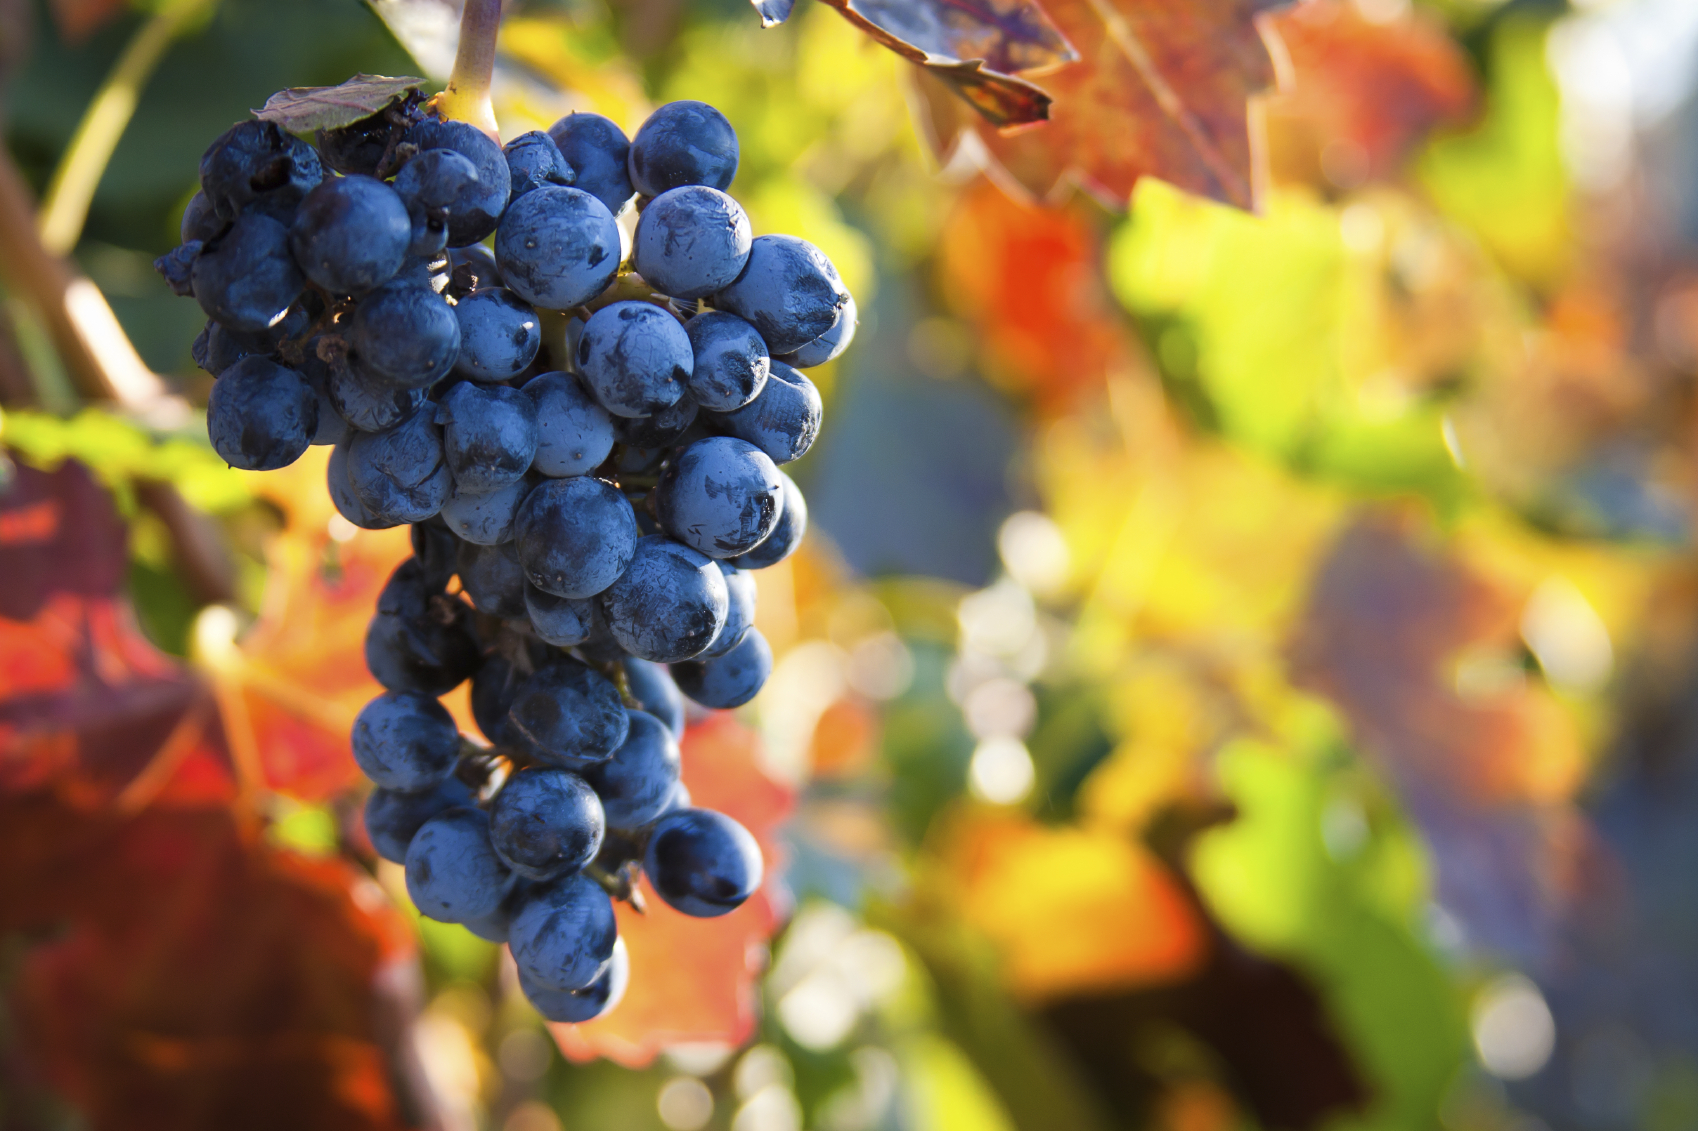 Fruit on the vine